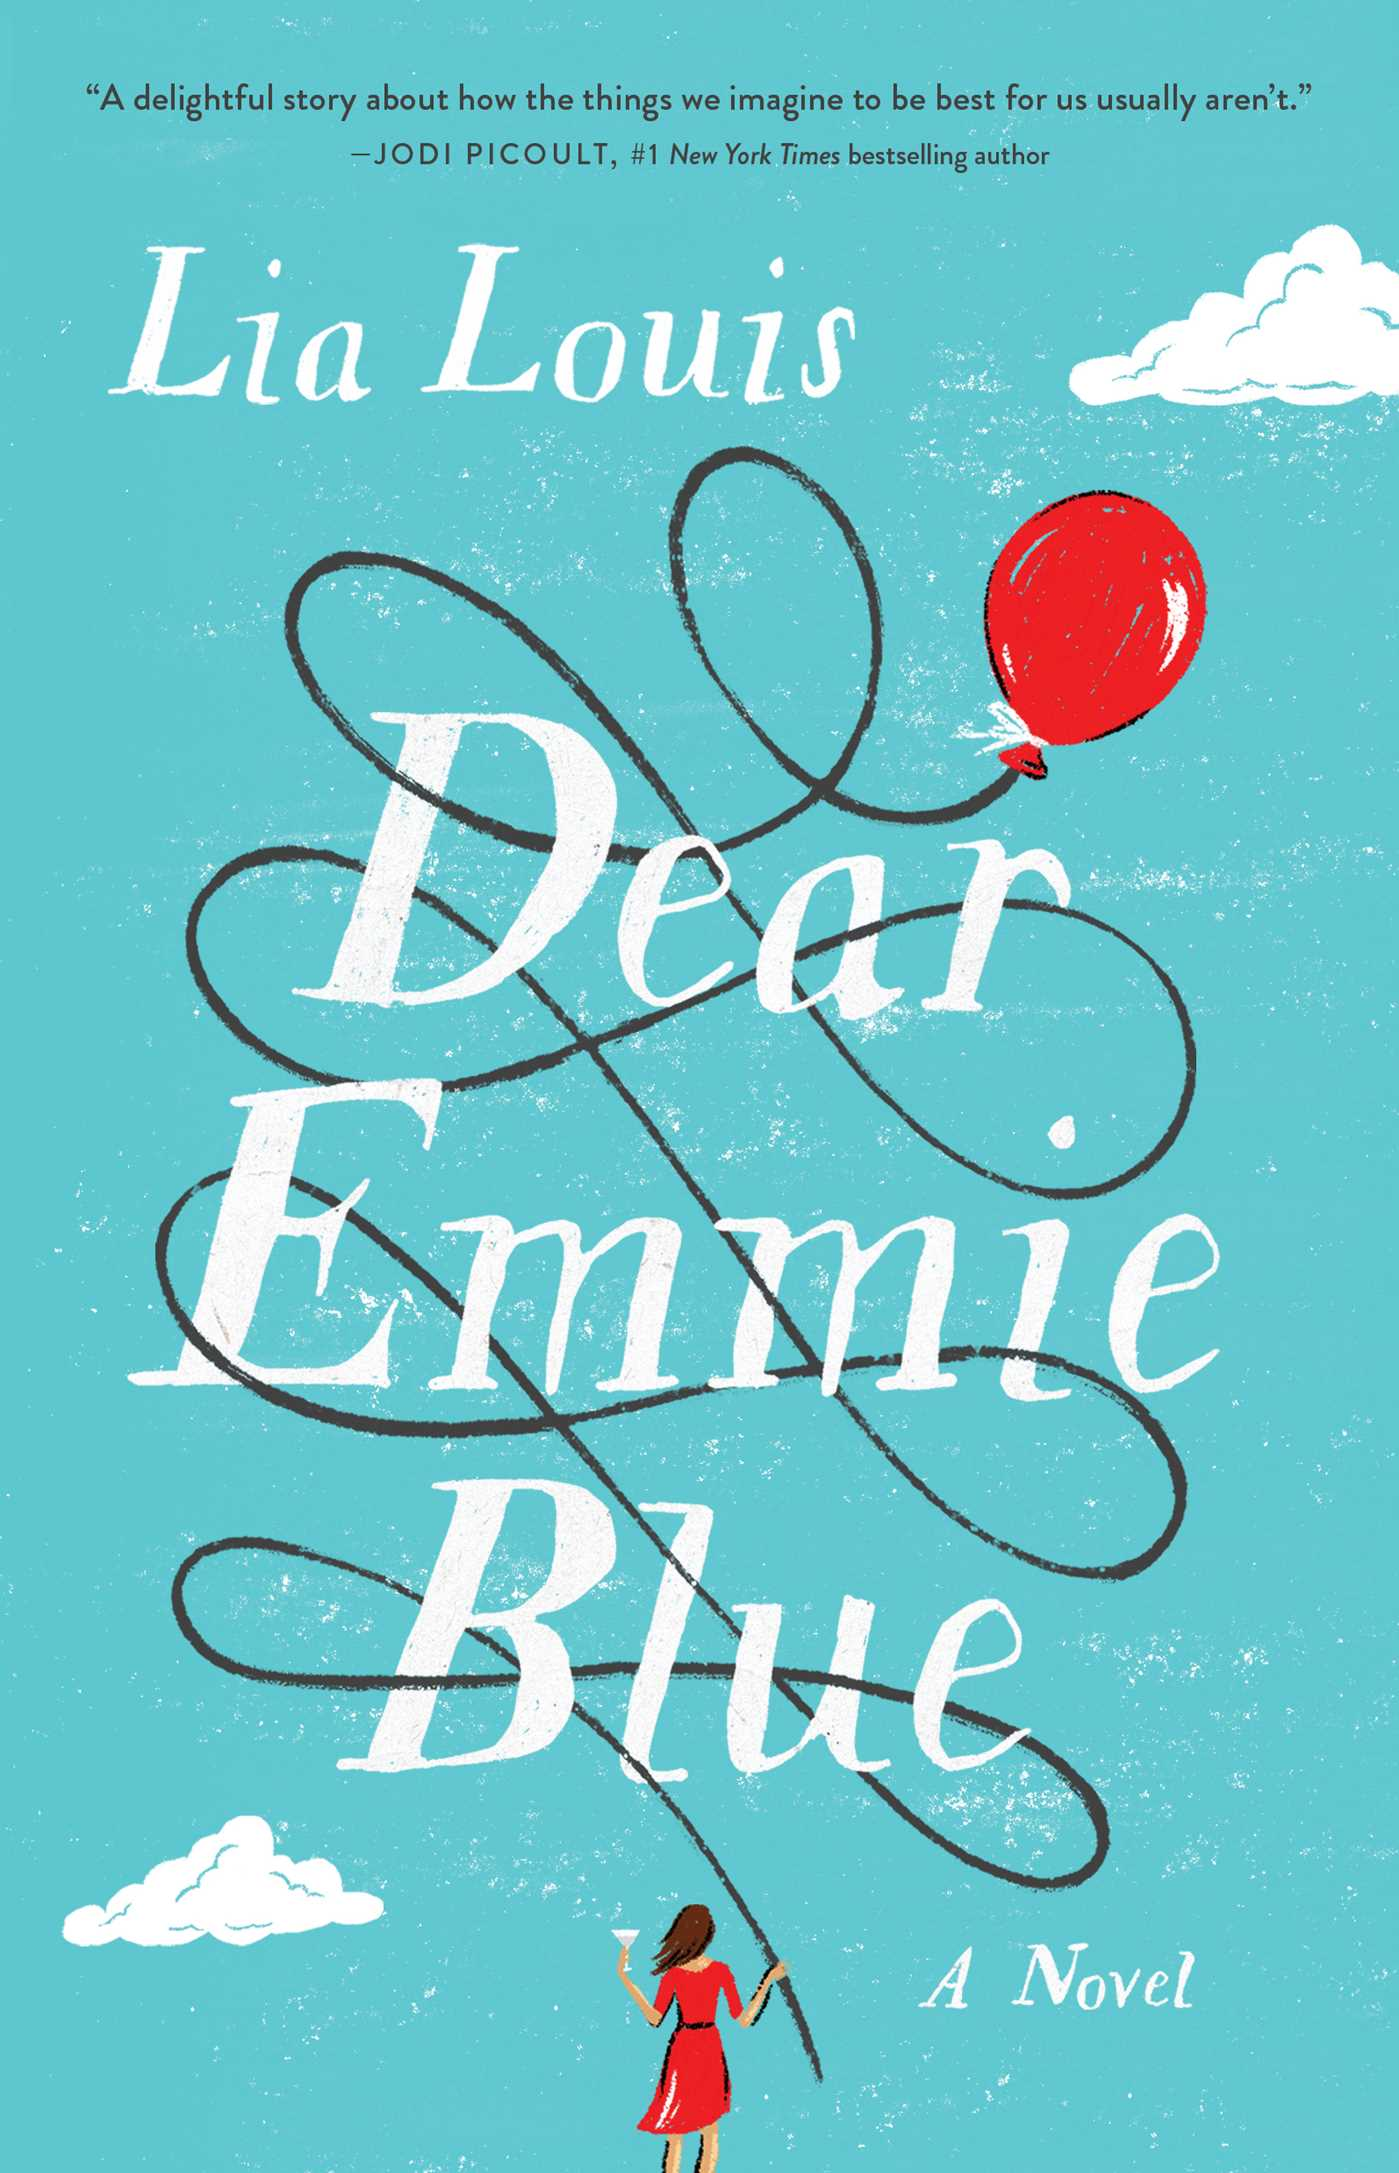 Dear Emmie Blue: A Novel